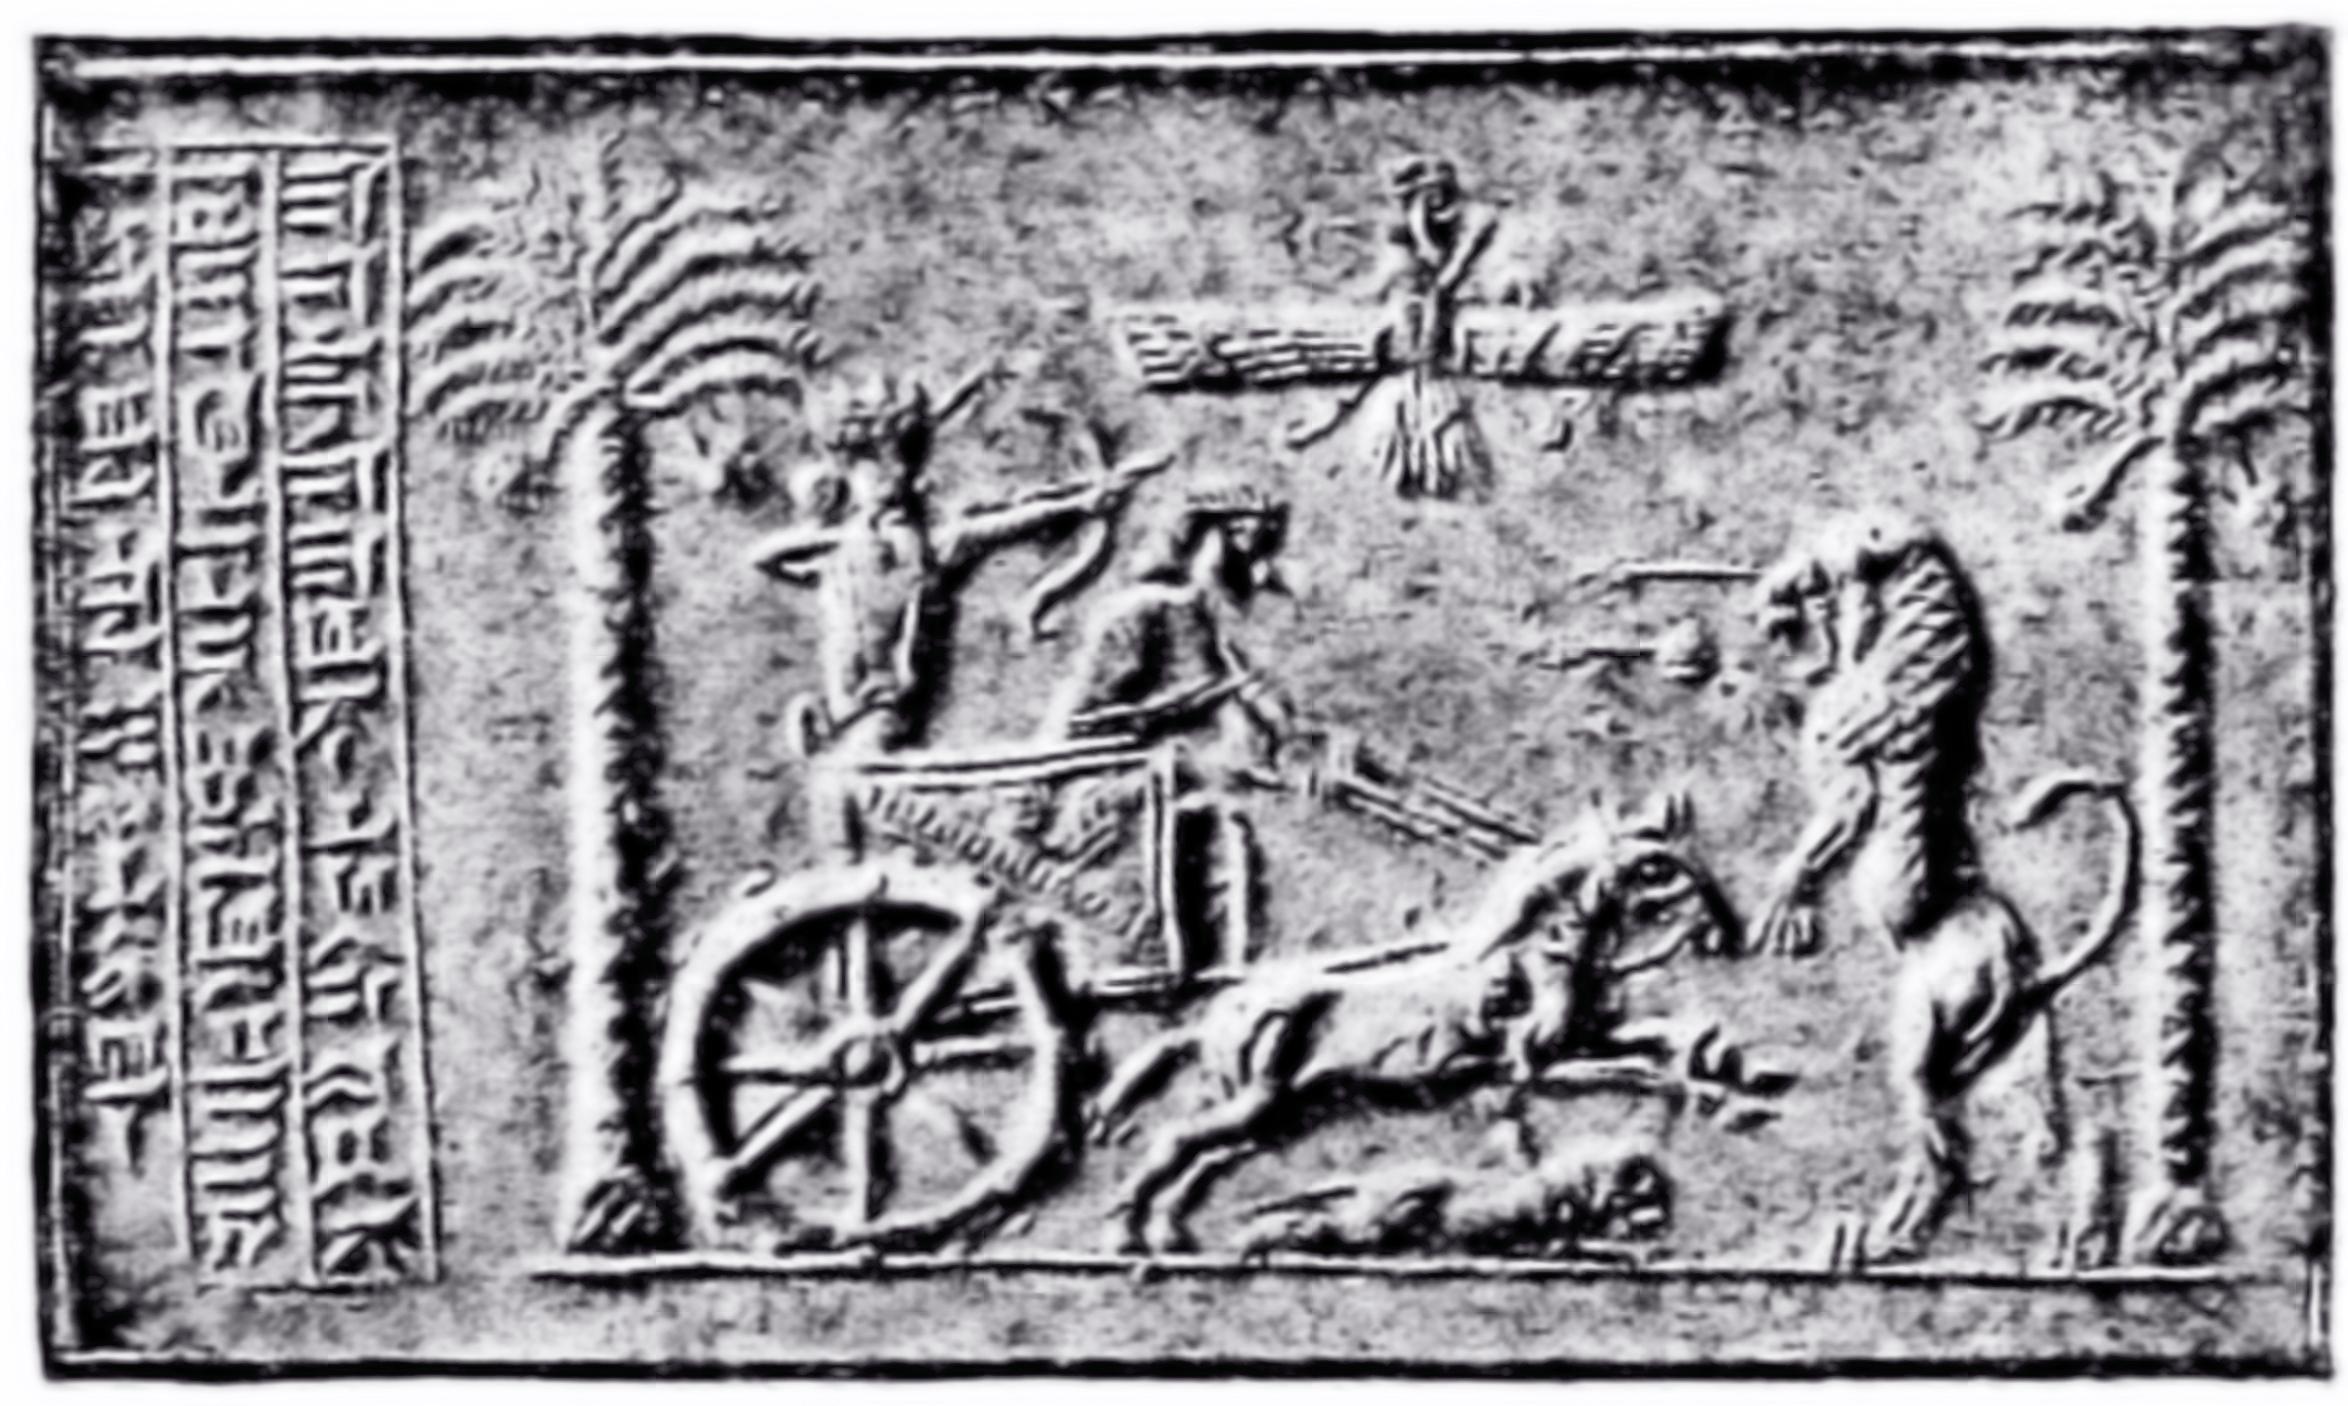 https://upload.wikimedia.org/wikipedia/commons/d/dc/Seal_of_Darius_the_Great.jpg